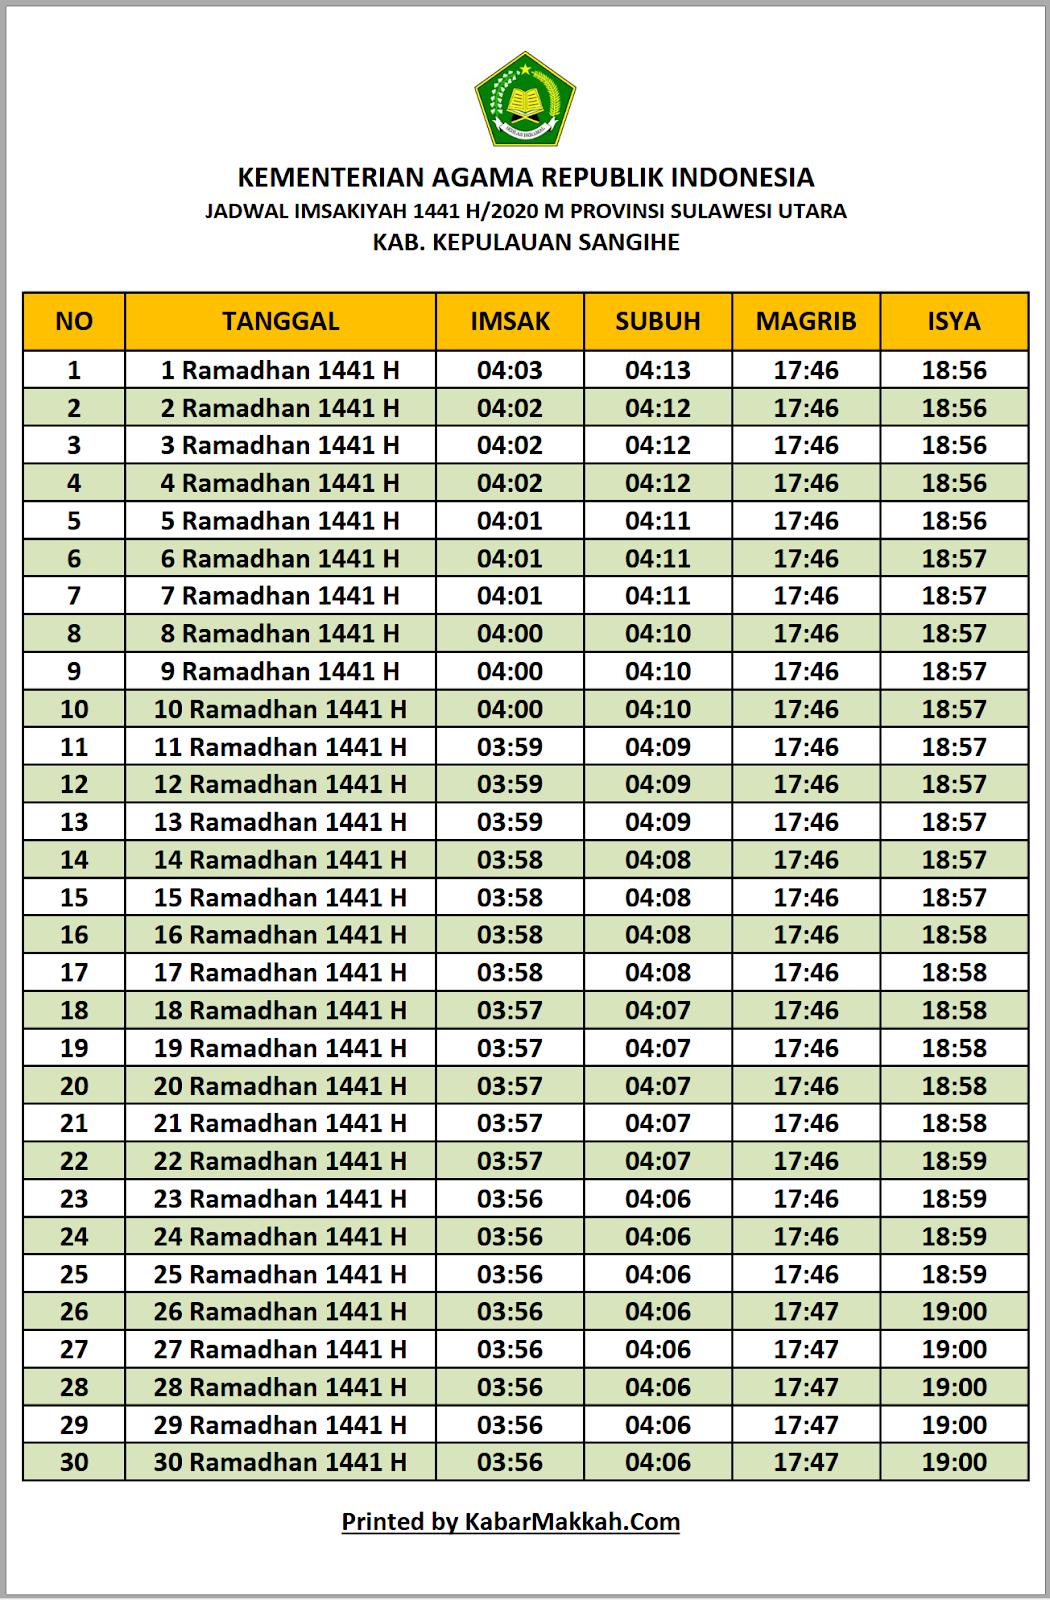 Jadwal Puasa Kepulauan Sangihe 2020